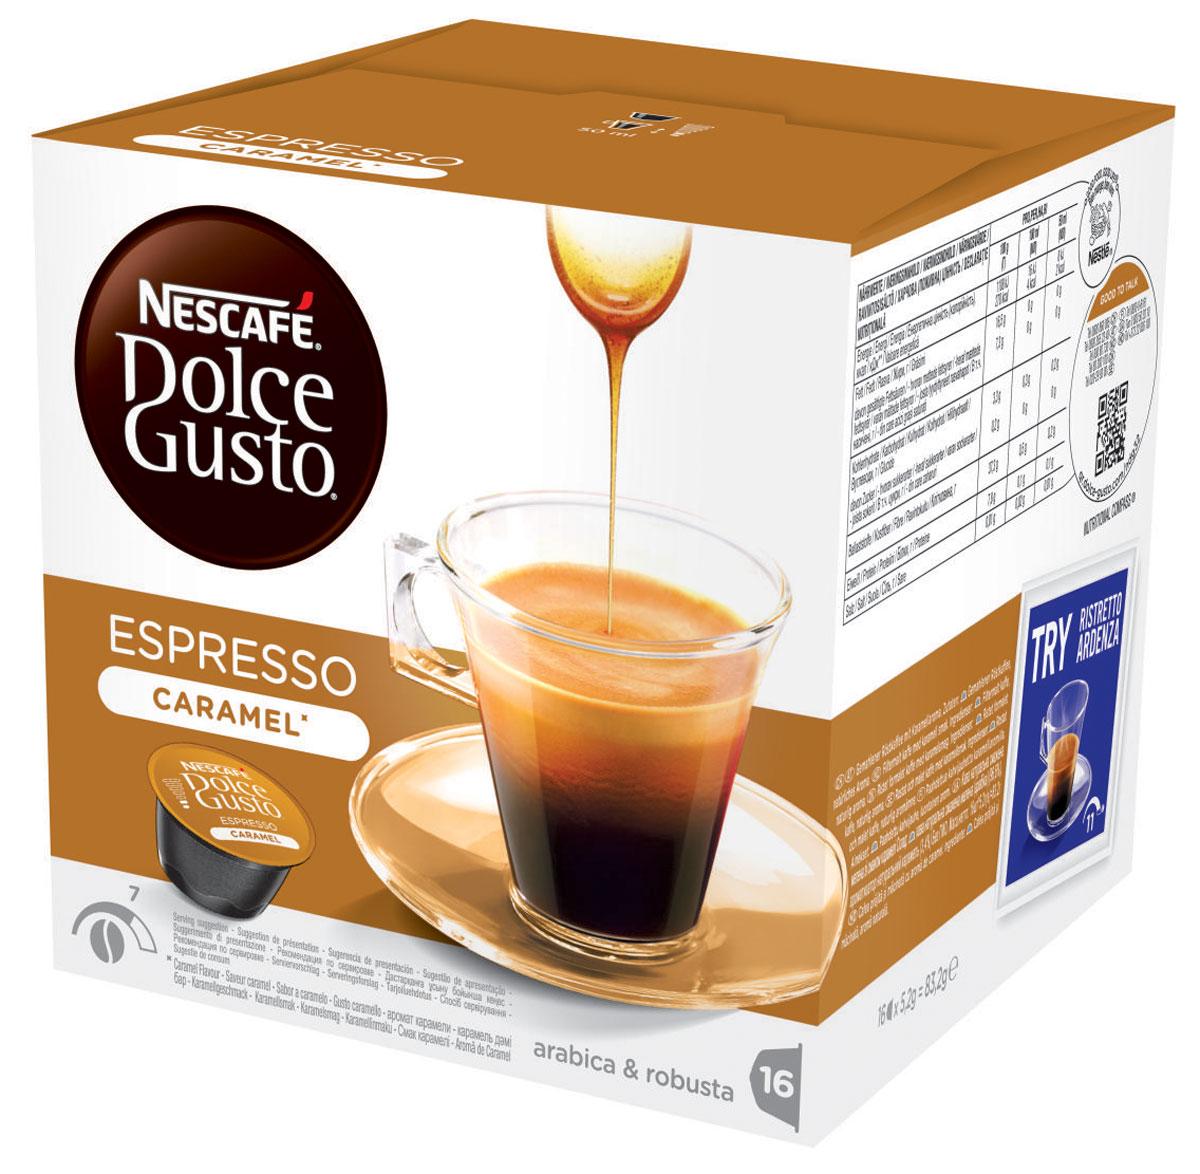 Nescafe Dolce Gusto Espresso Caramel кофе в капсулах, 16 шт 12128780